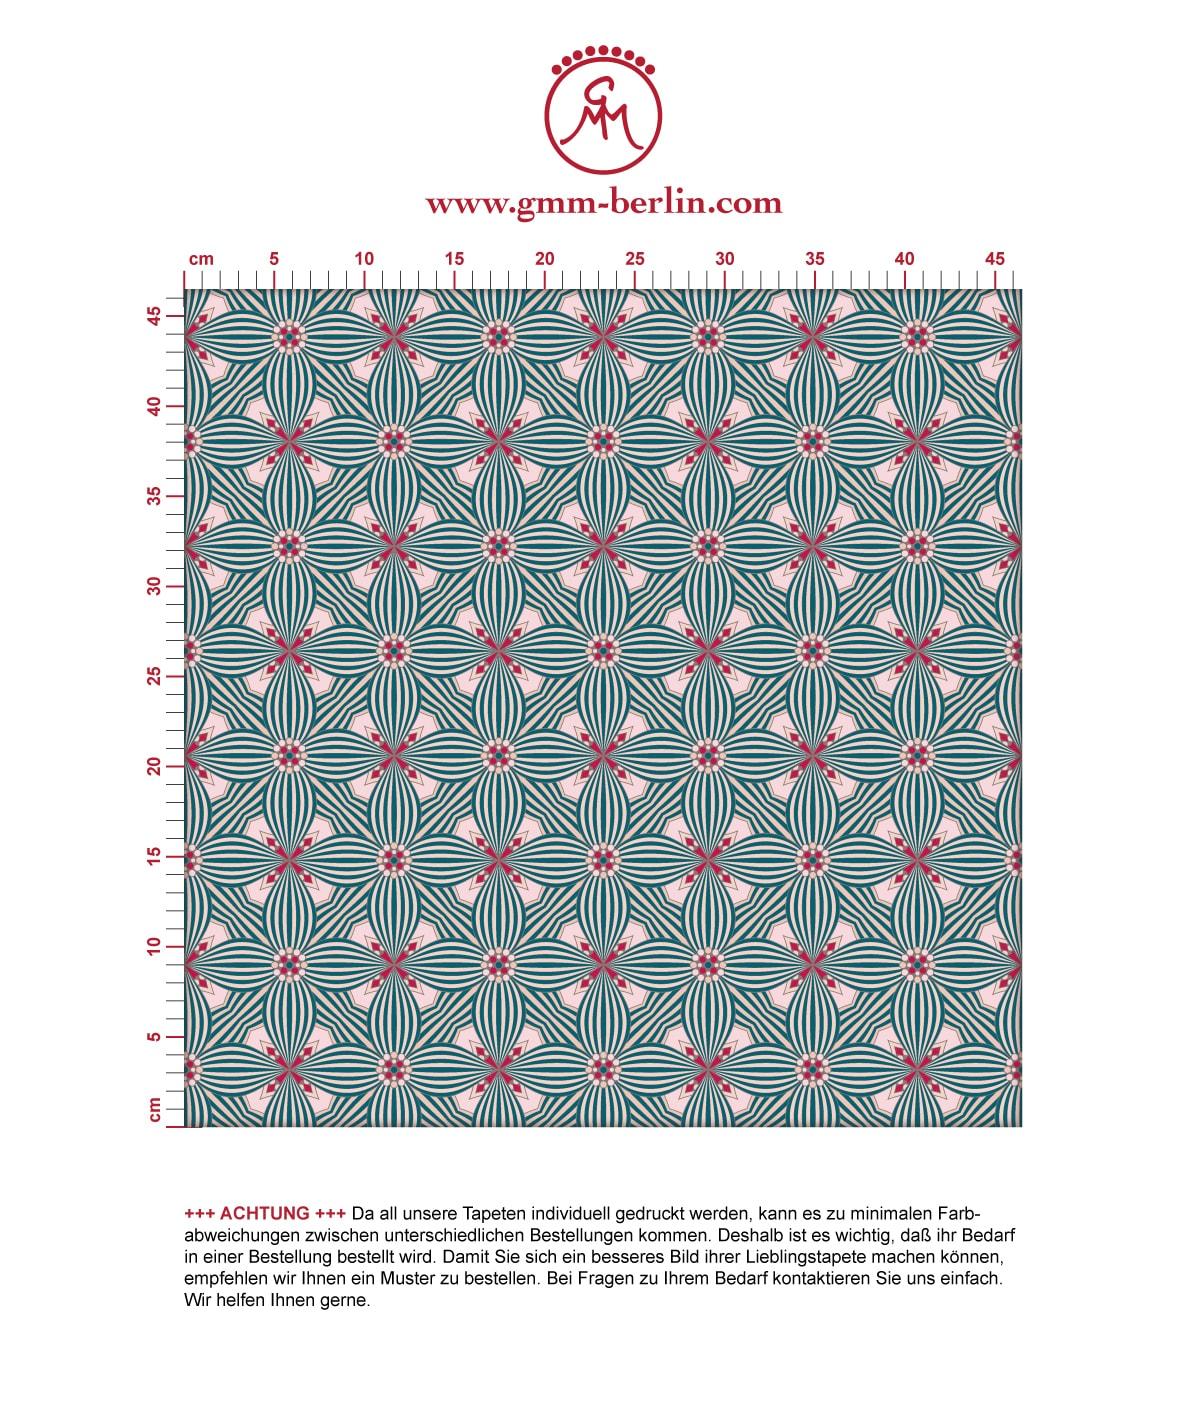 Art Deko Ornamenttapete Lilly Retro Muster in rosa - Design Tapete für Flur, Büro. Aus dem GMM-BERLIN.com Sortiment: Schöne Tapeten in der Farbe: rosa